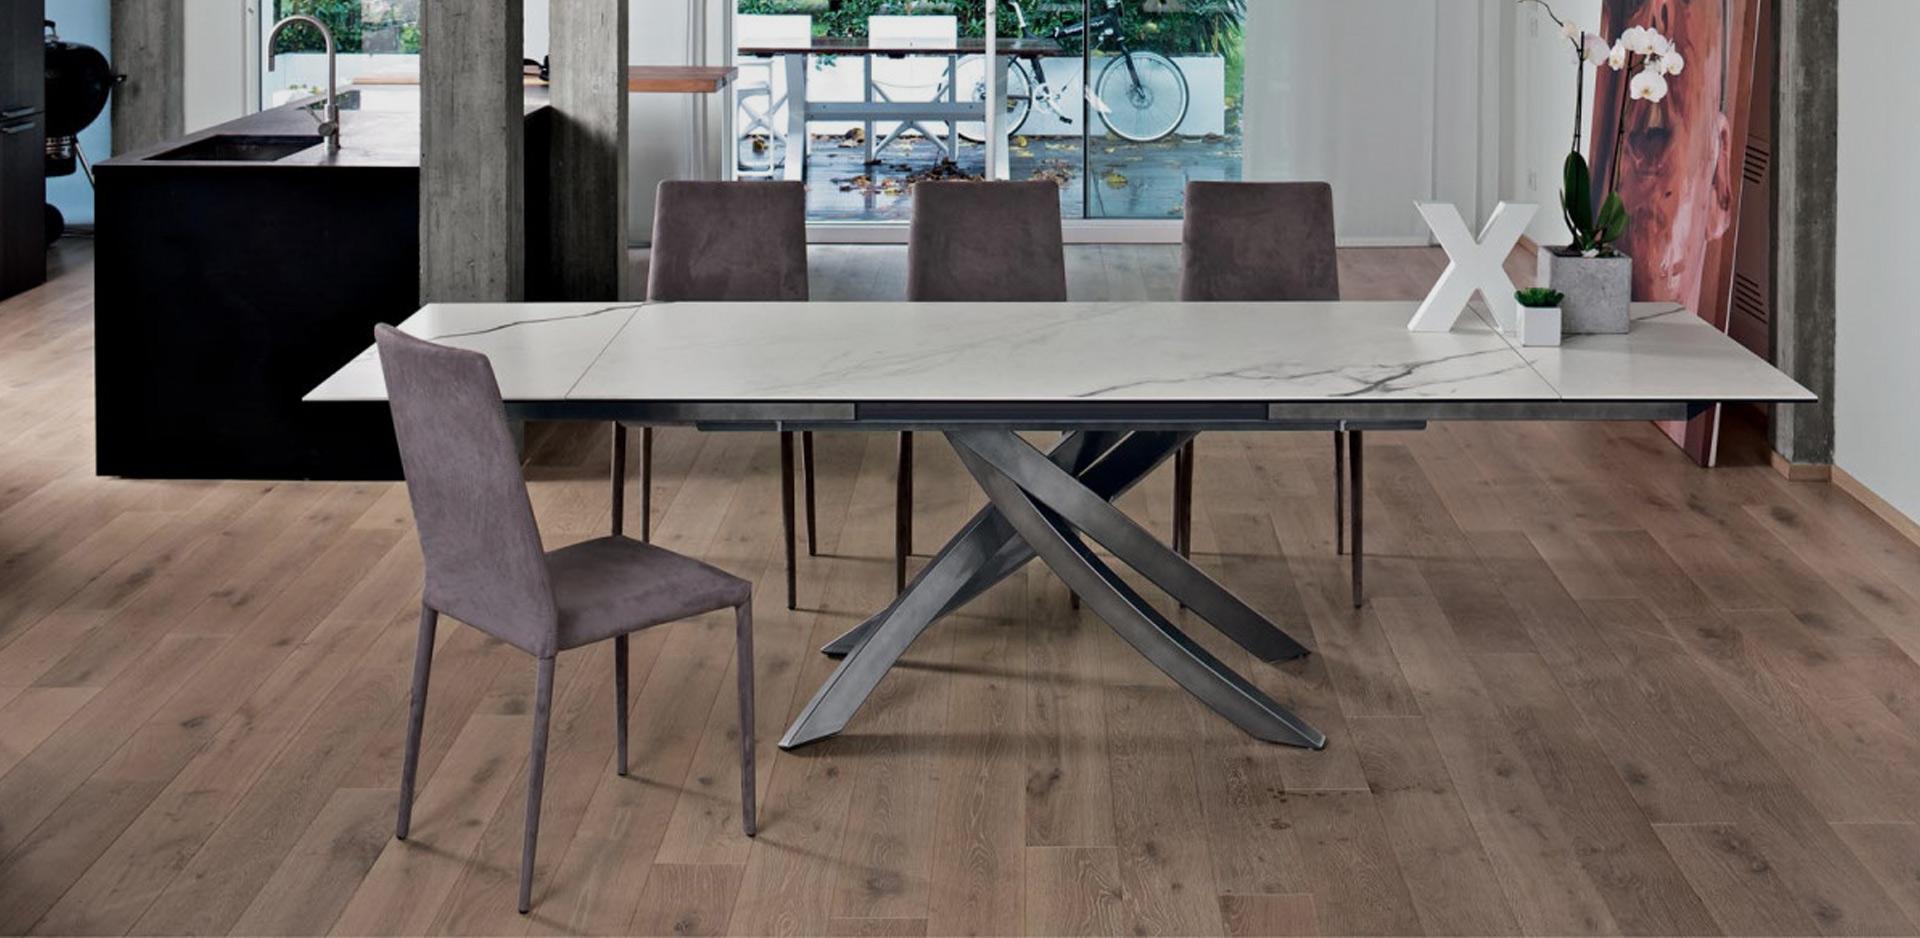 tavoli e sedie lissone resnati mobili tavoli e sedie